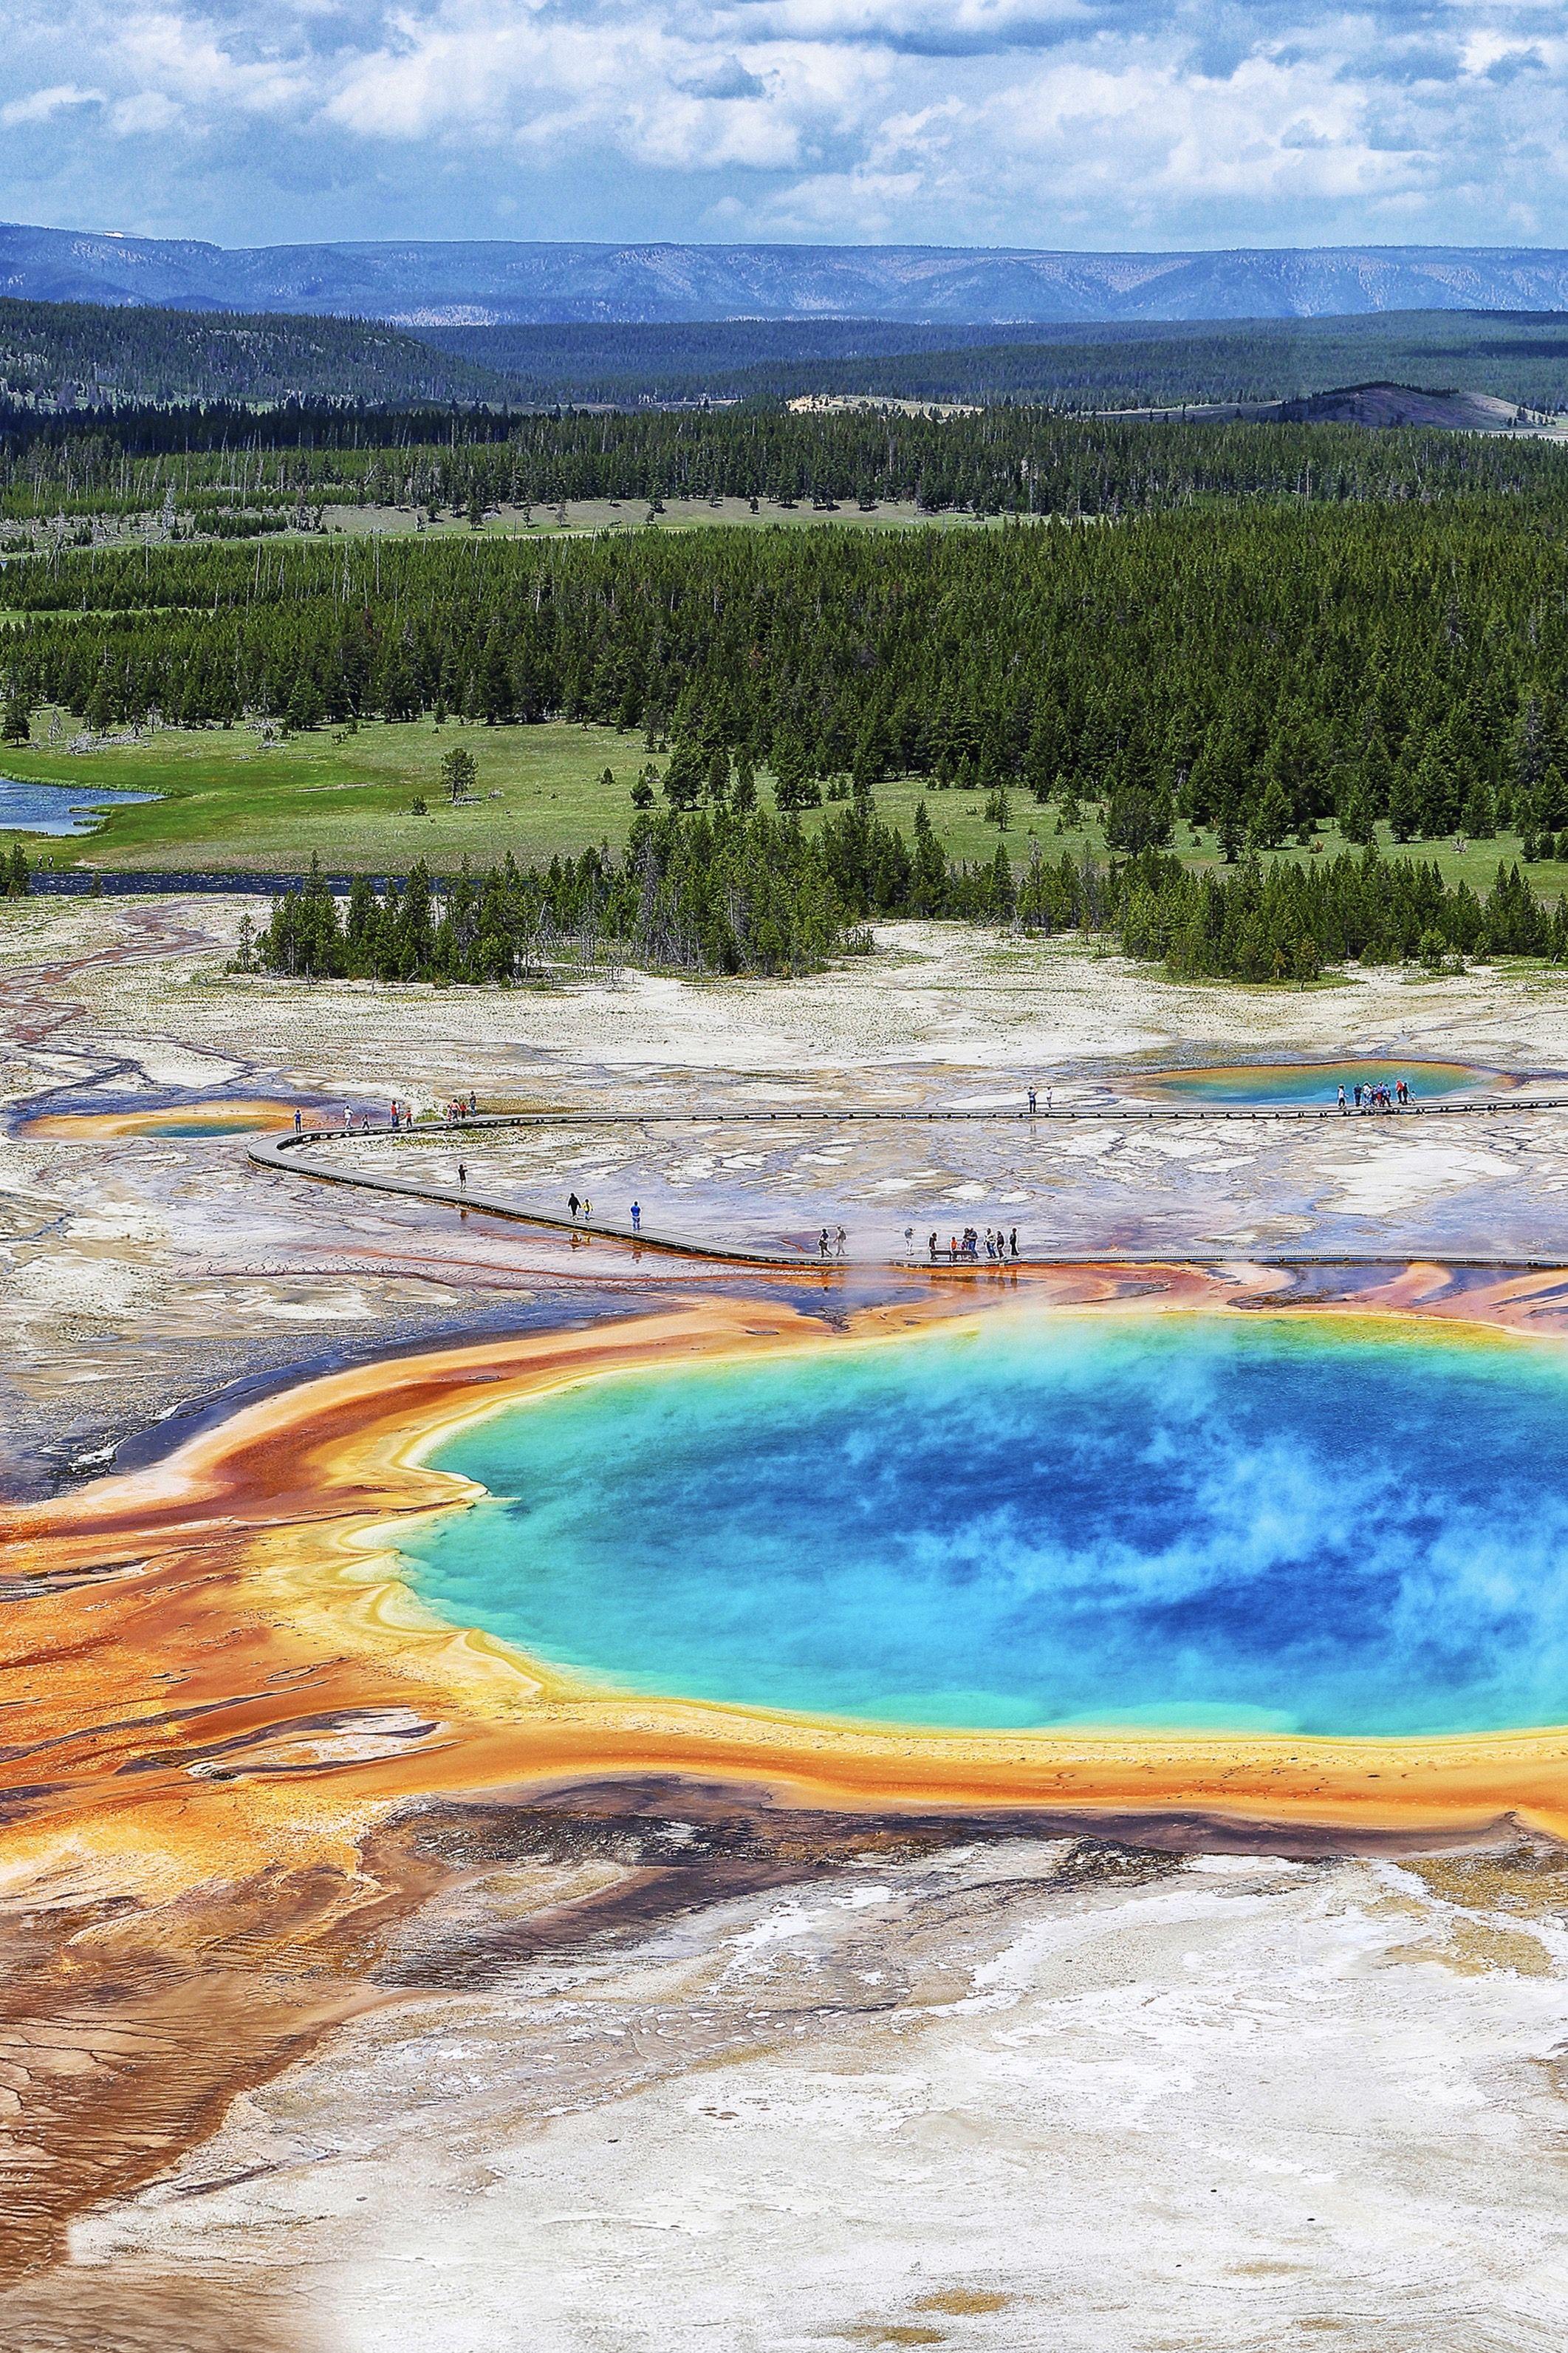 Virtual Tour Yellowstone National Park National Parks Tour Around The World Yellowstone National Park